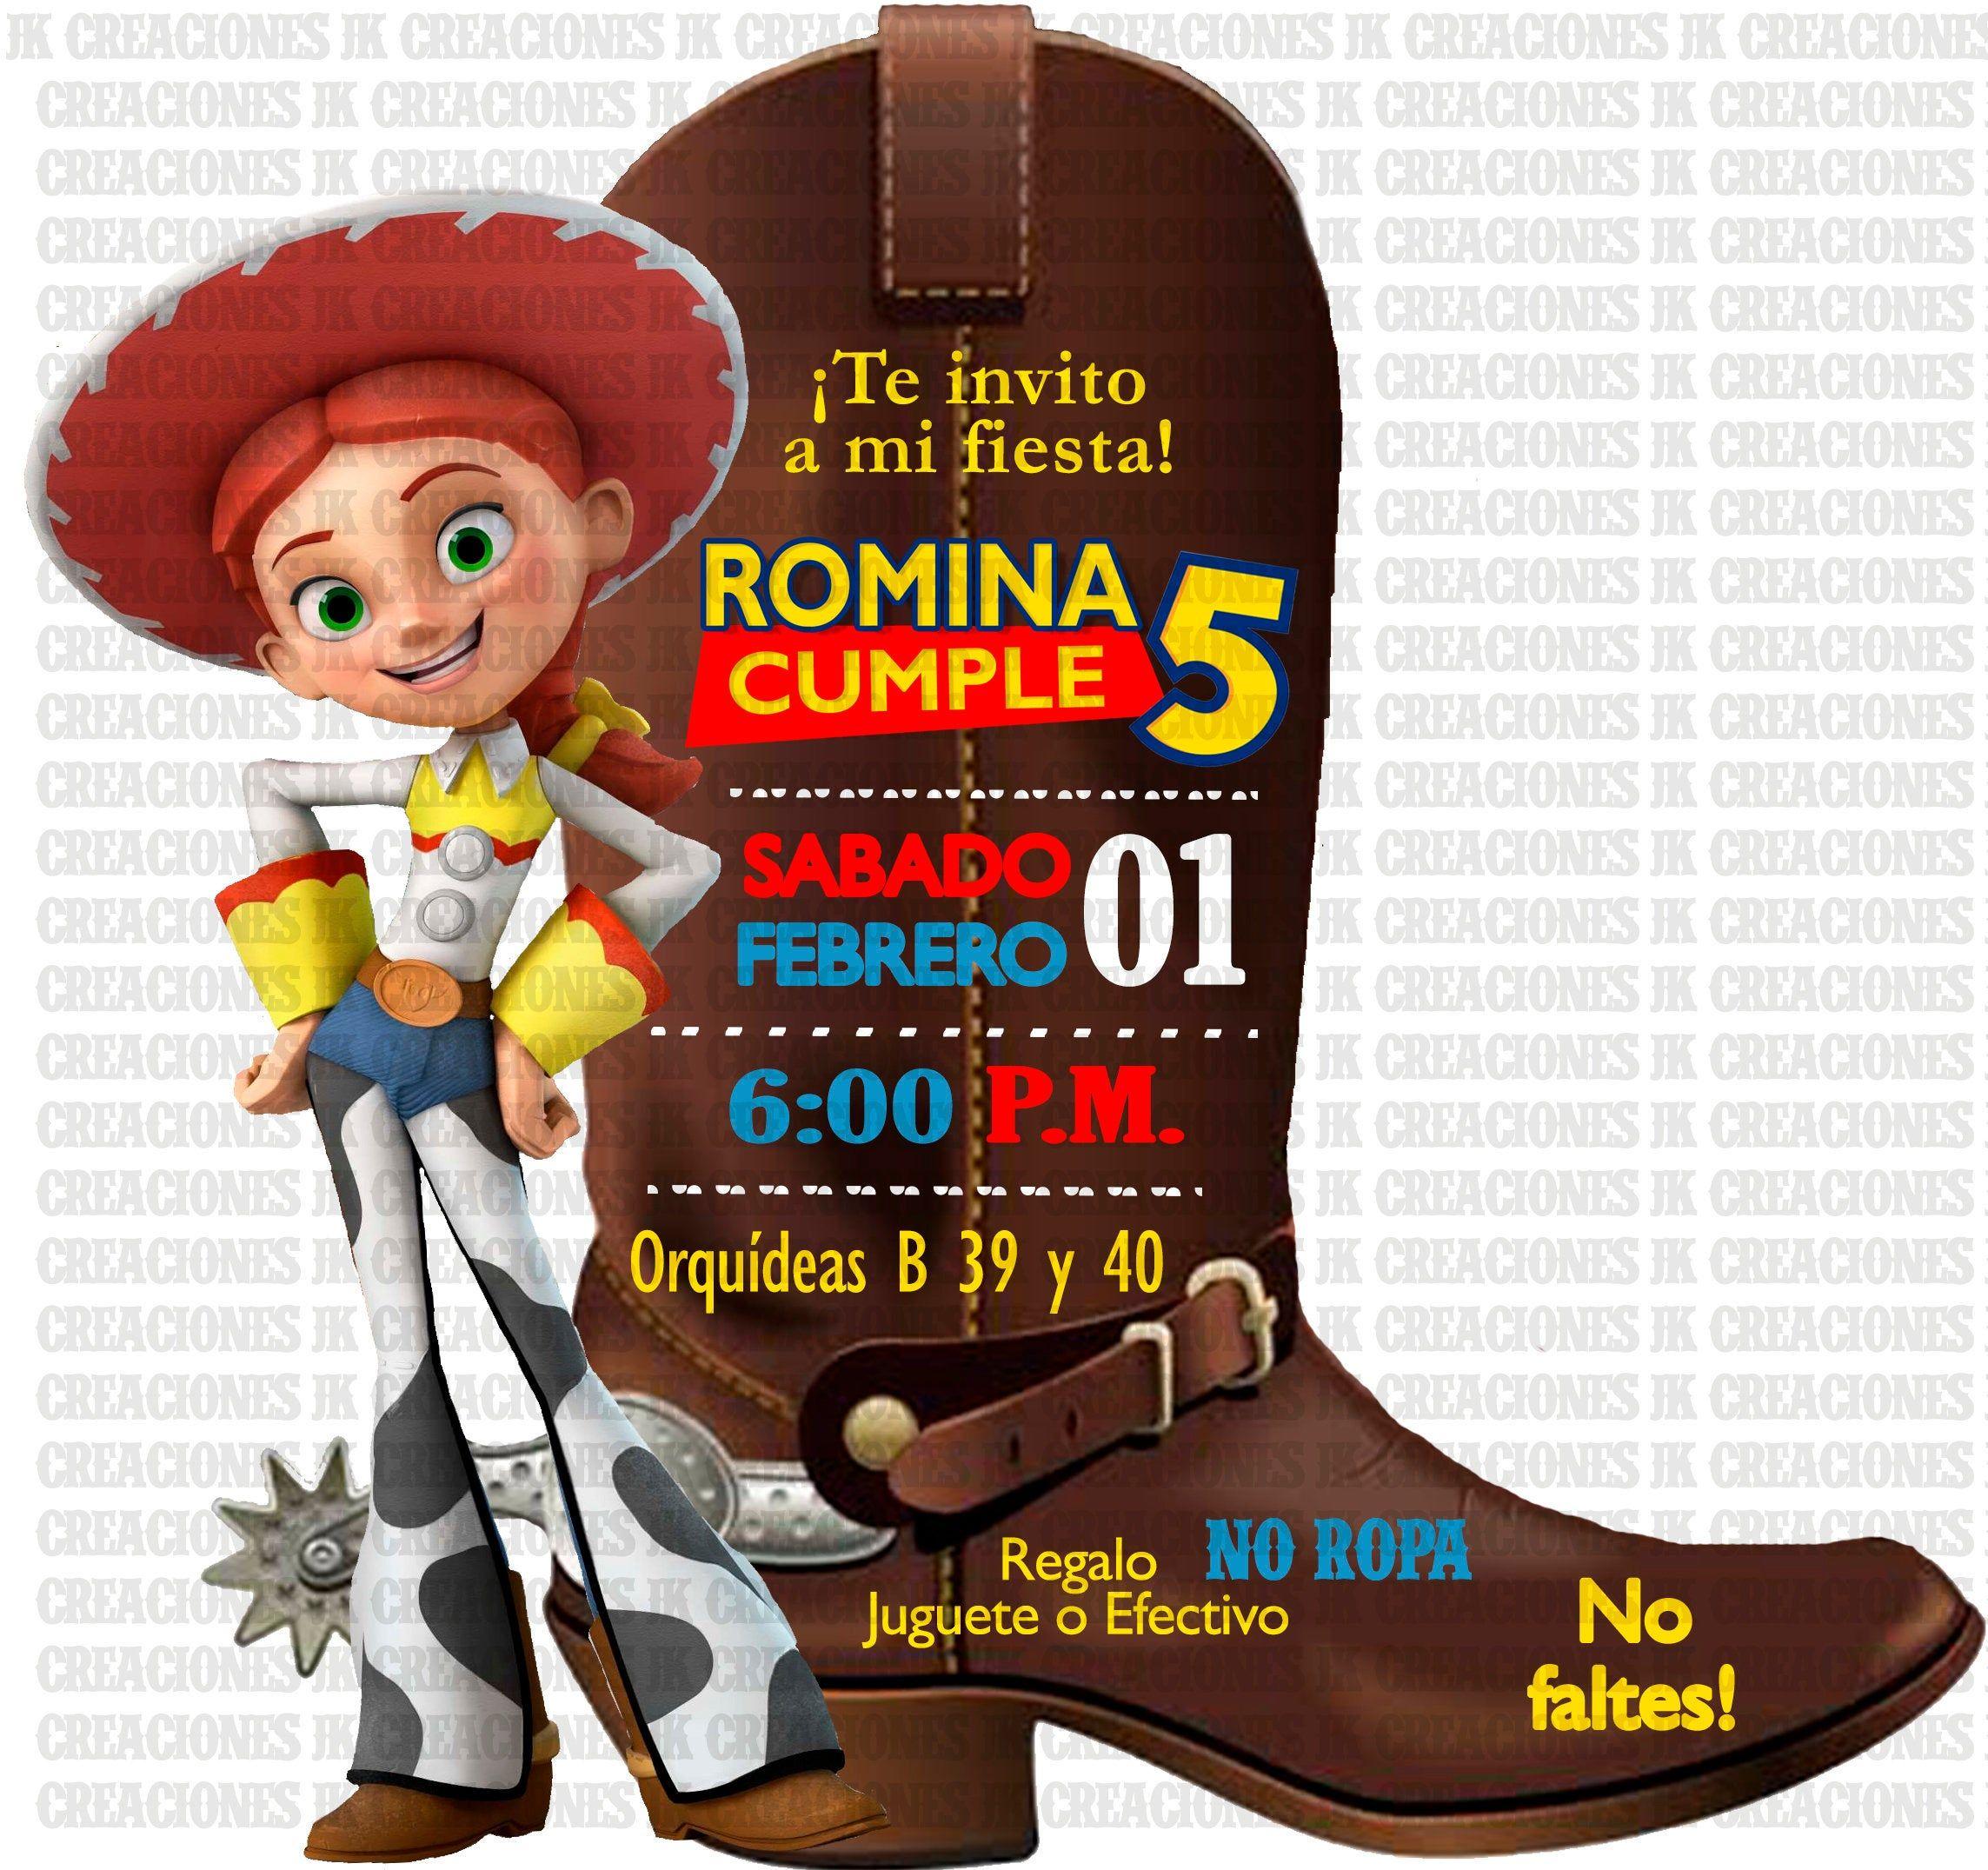 invitacion bota jessi la vaquerita, toy #story, SAME DAY en 2020 ...